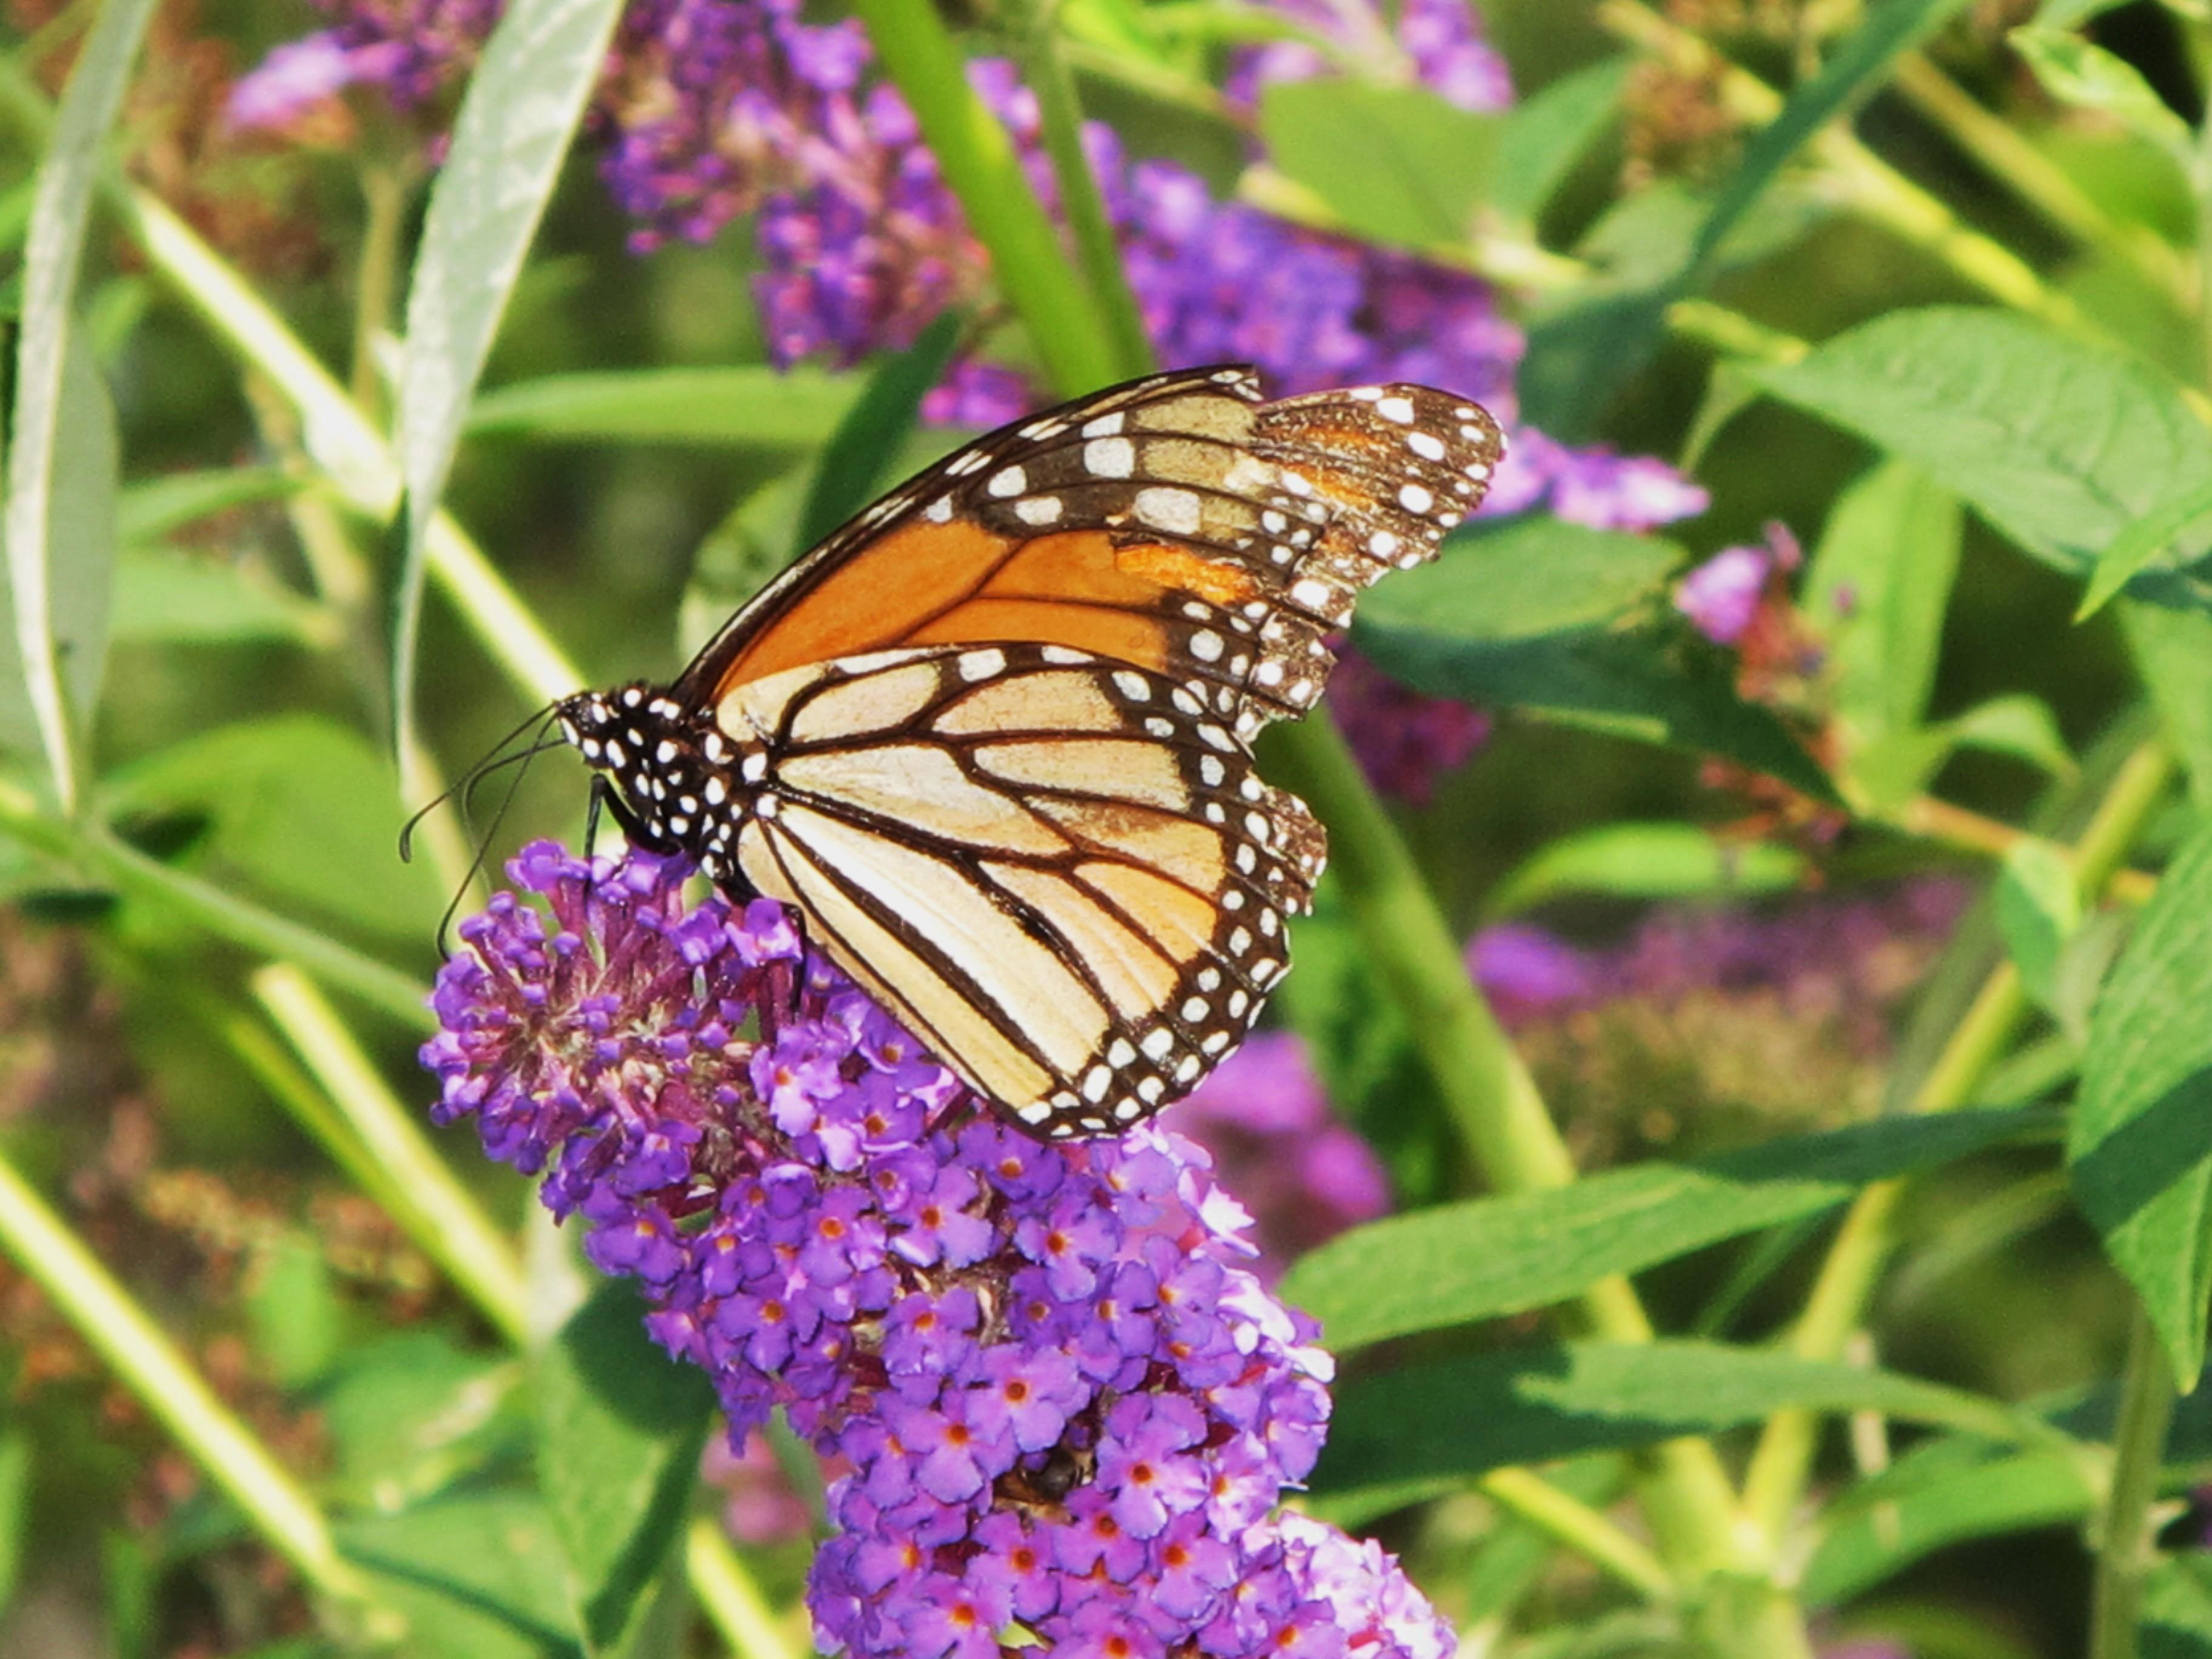 Attract Butterflies to your Garden - Graf Growers